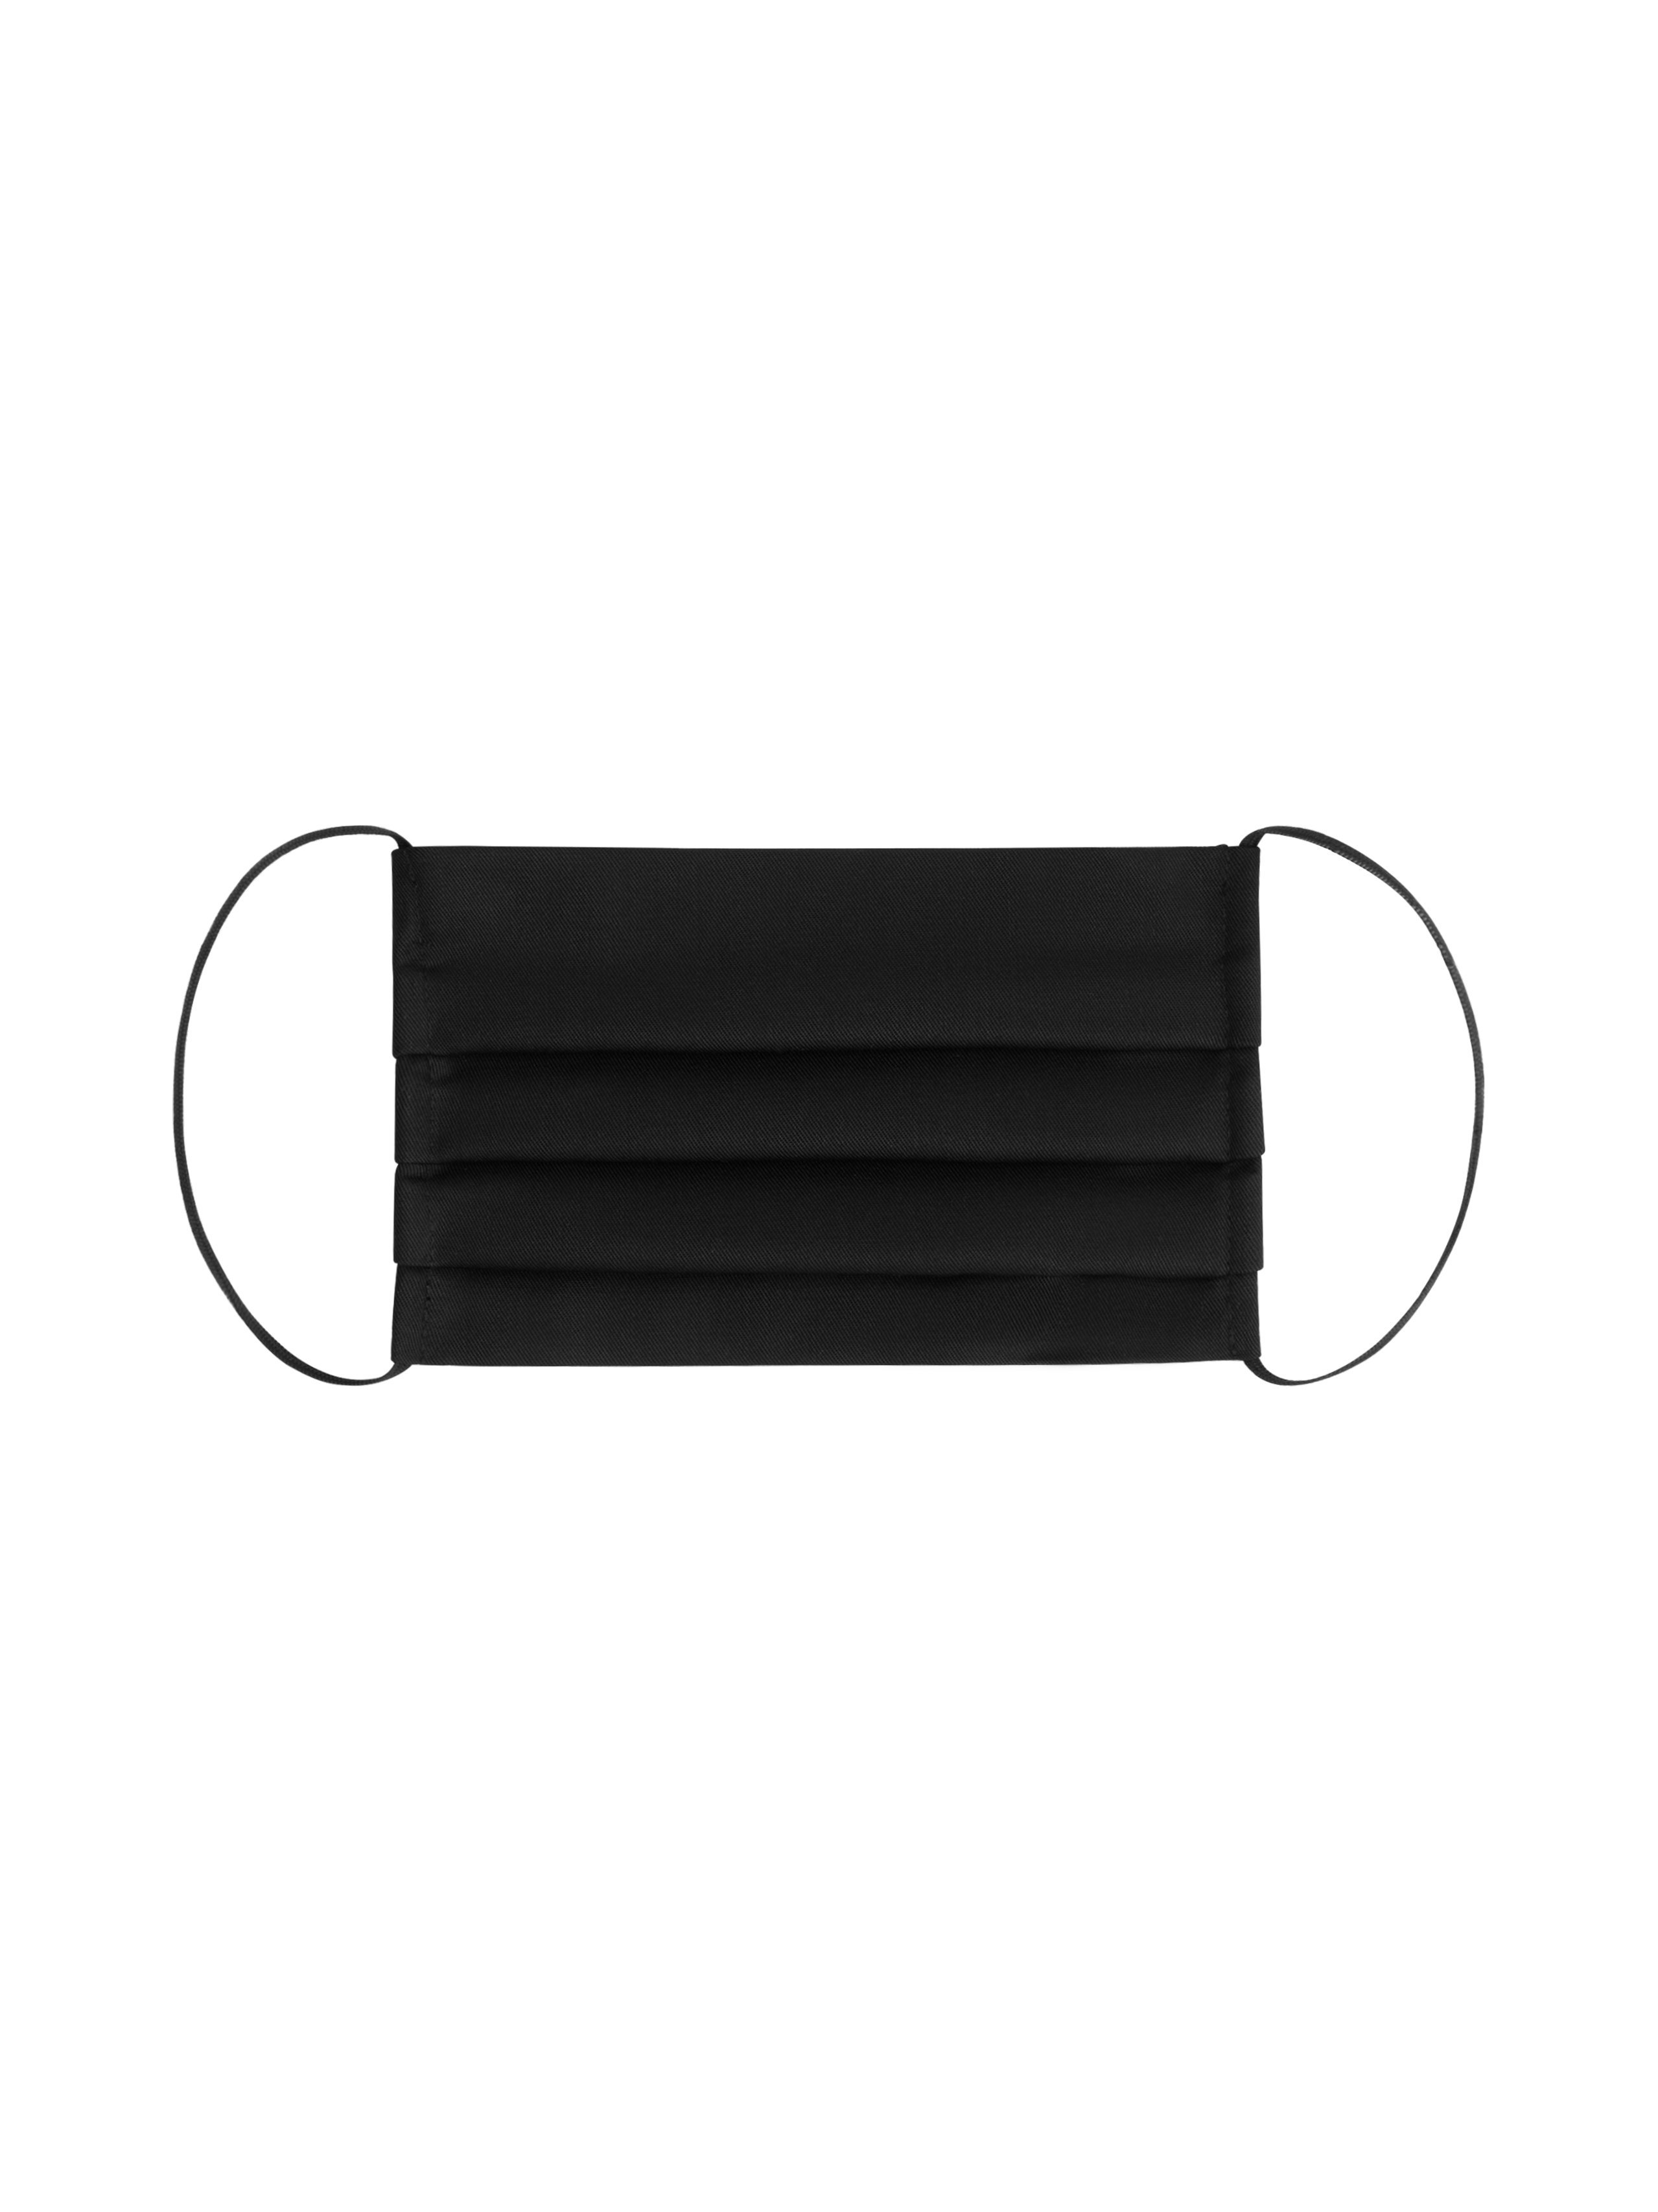 Accessory LNC1 Black